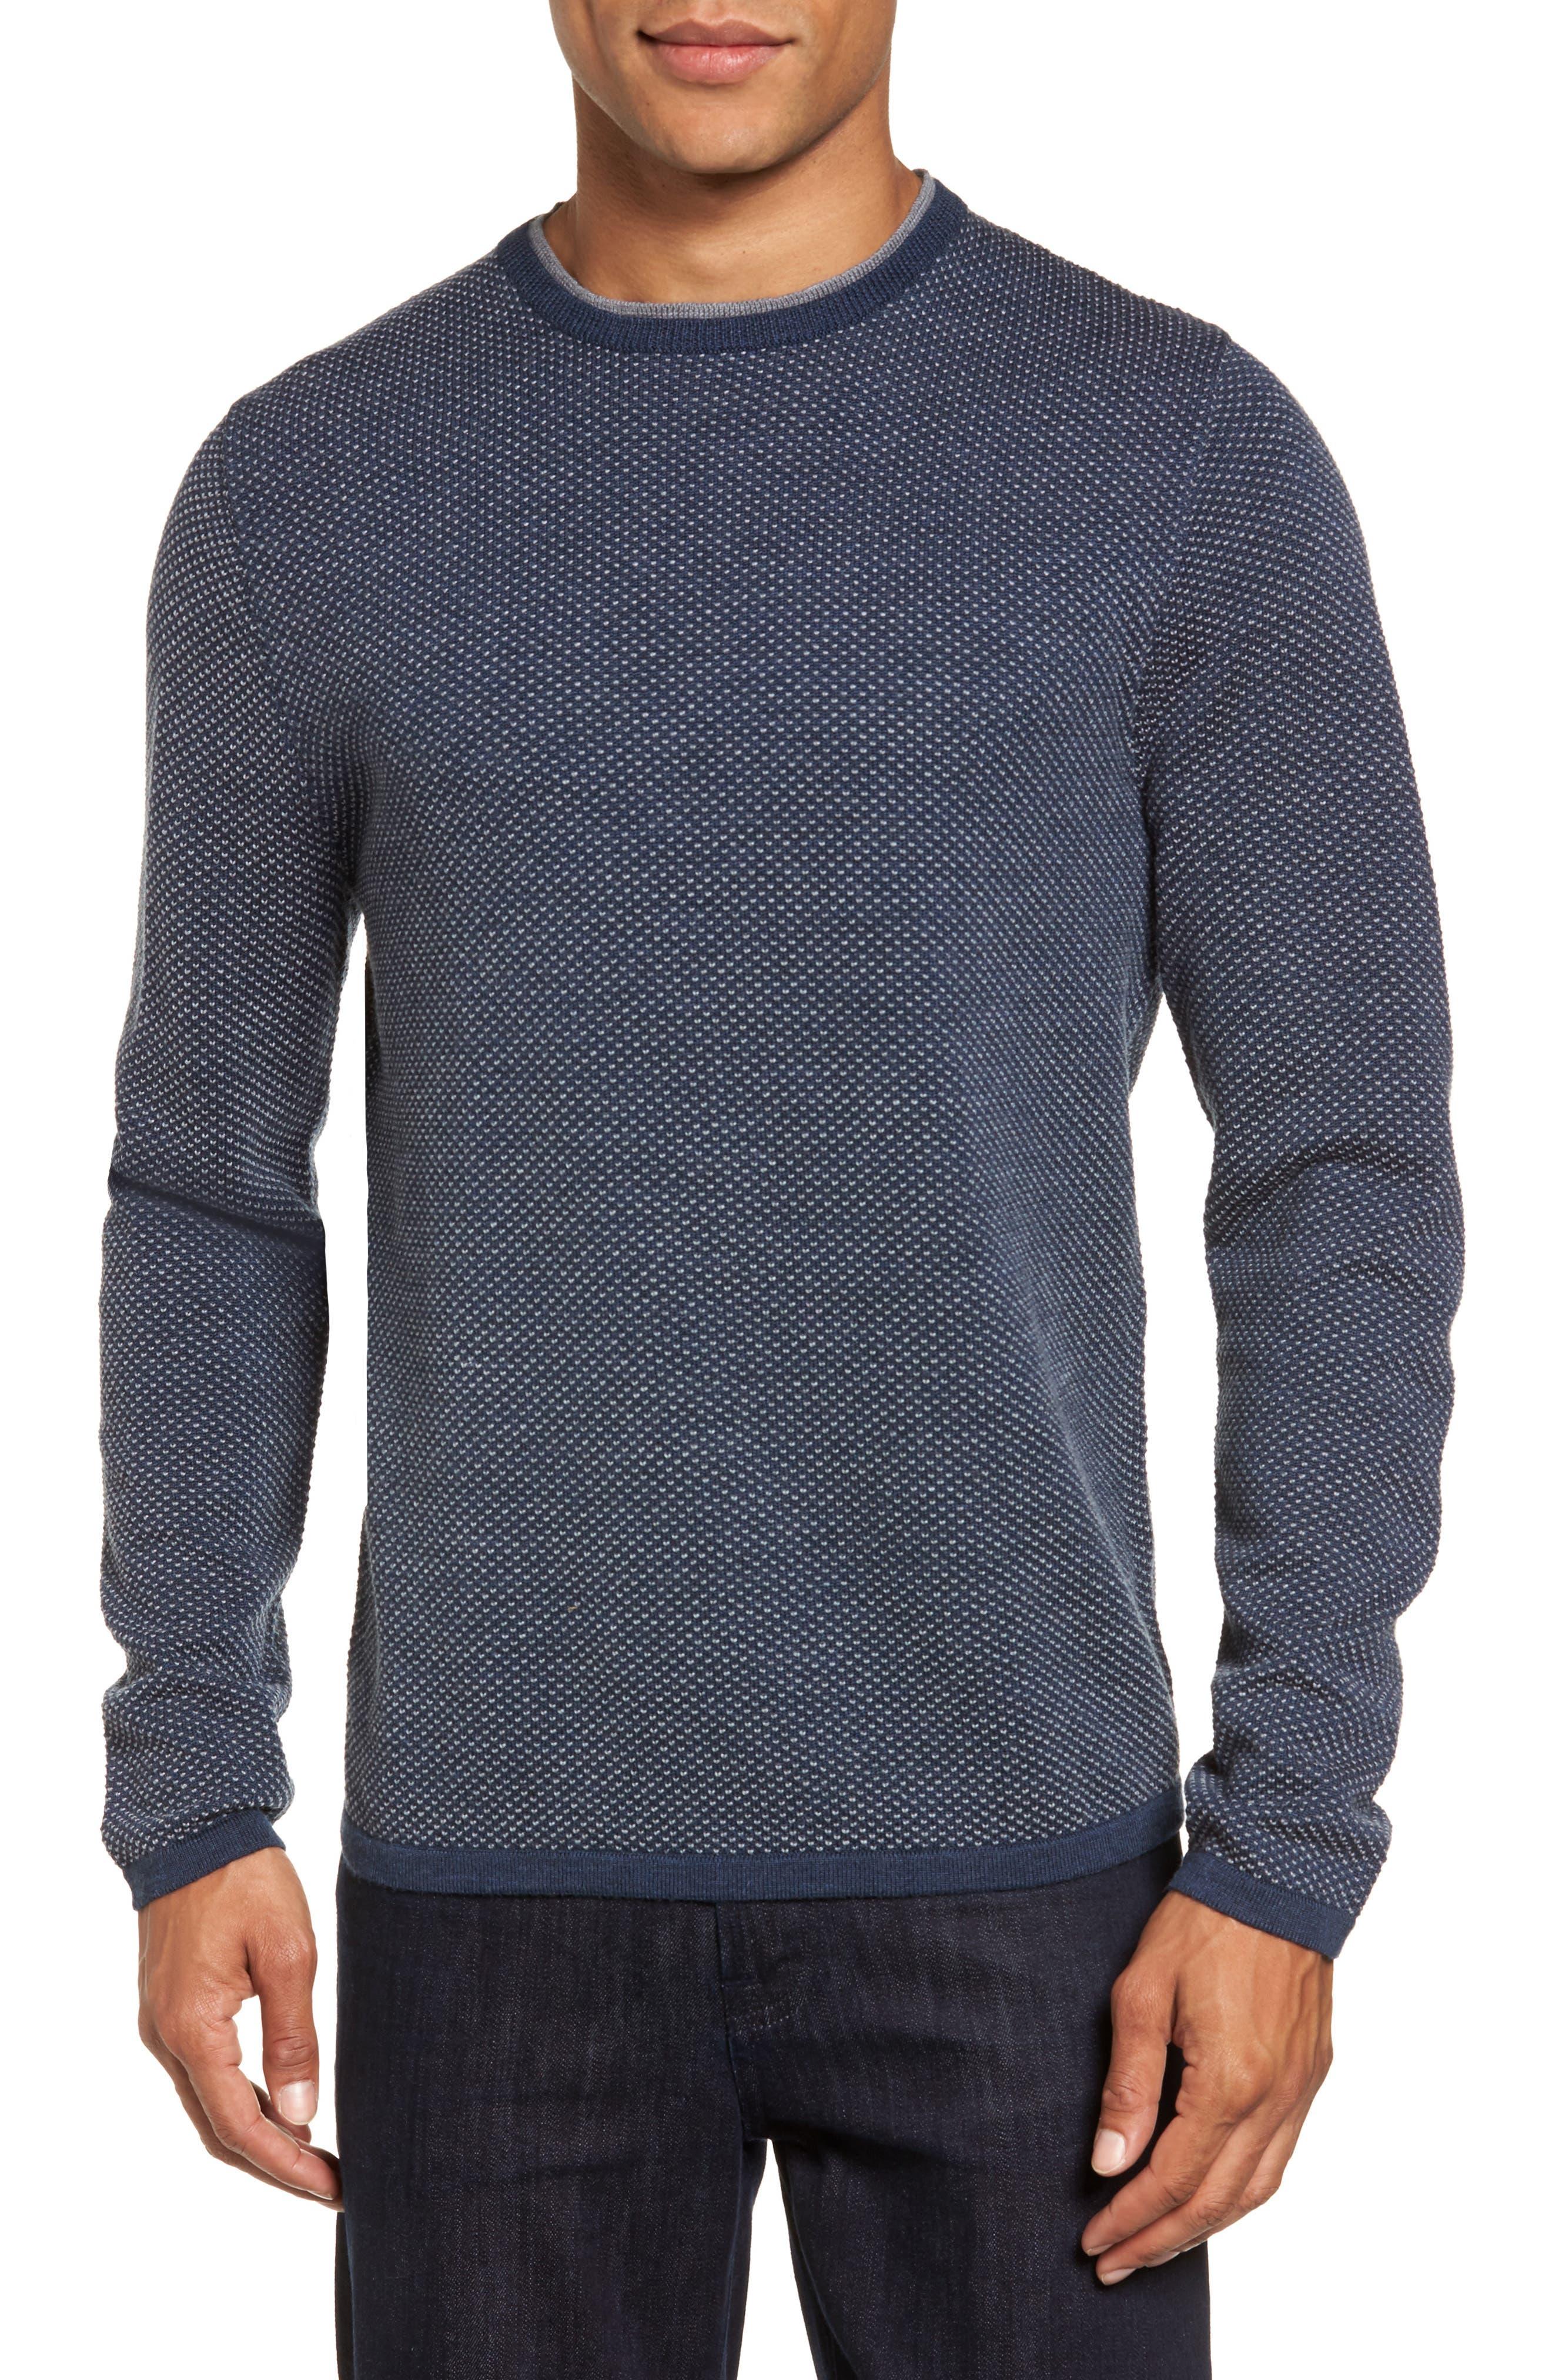 Alternate Image 1 Selected - Nordstrom Men's Shop Crewneck Knit Sweater (Tall)